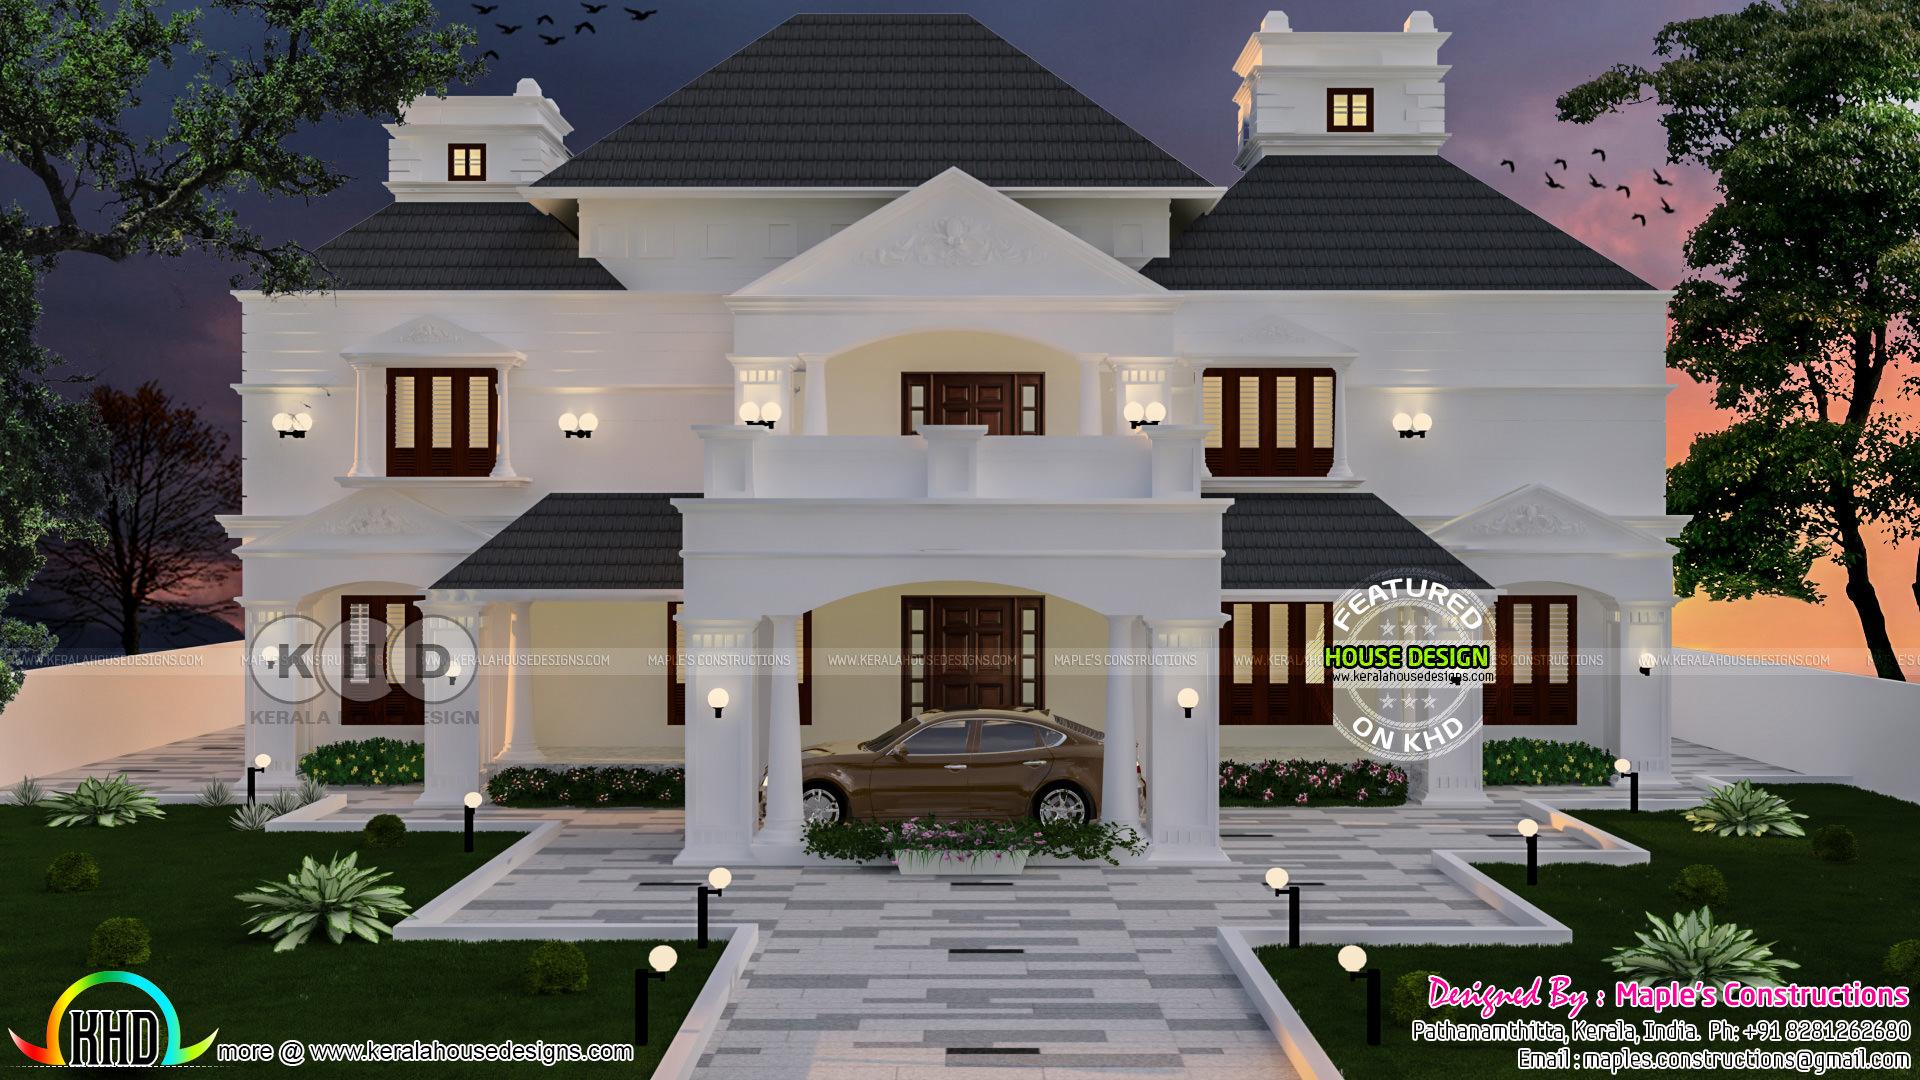 6 Bedroom Colonial Model House Plan 343 Sq M Kerala Home